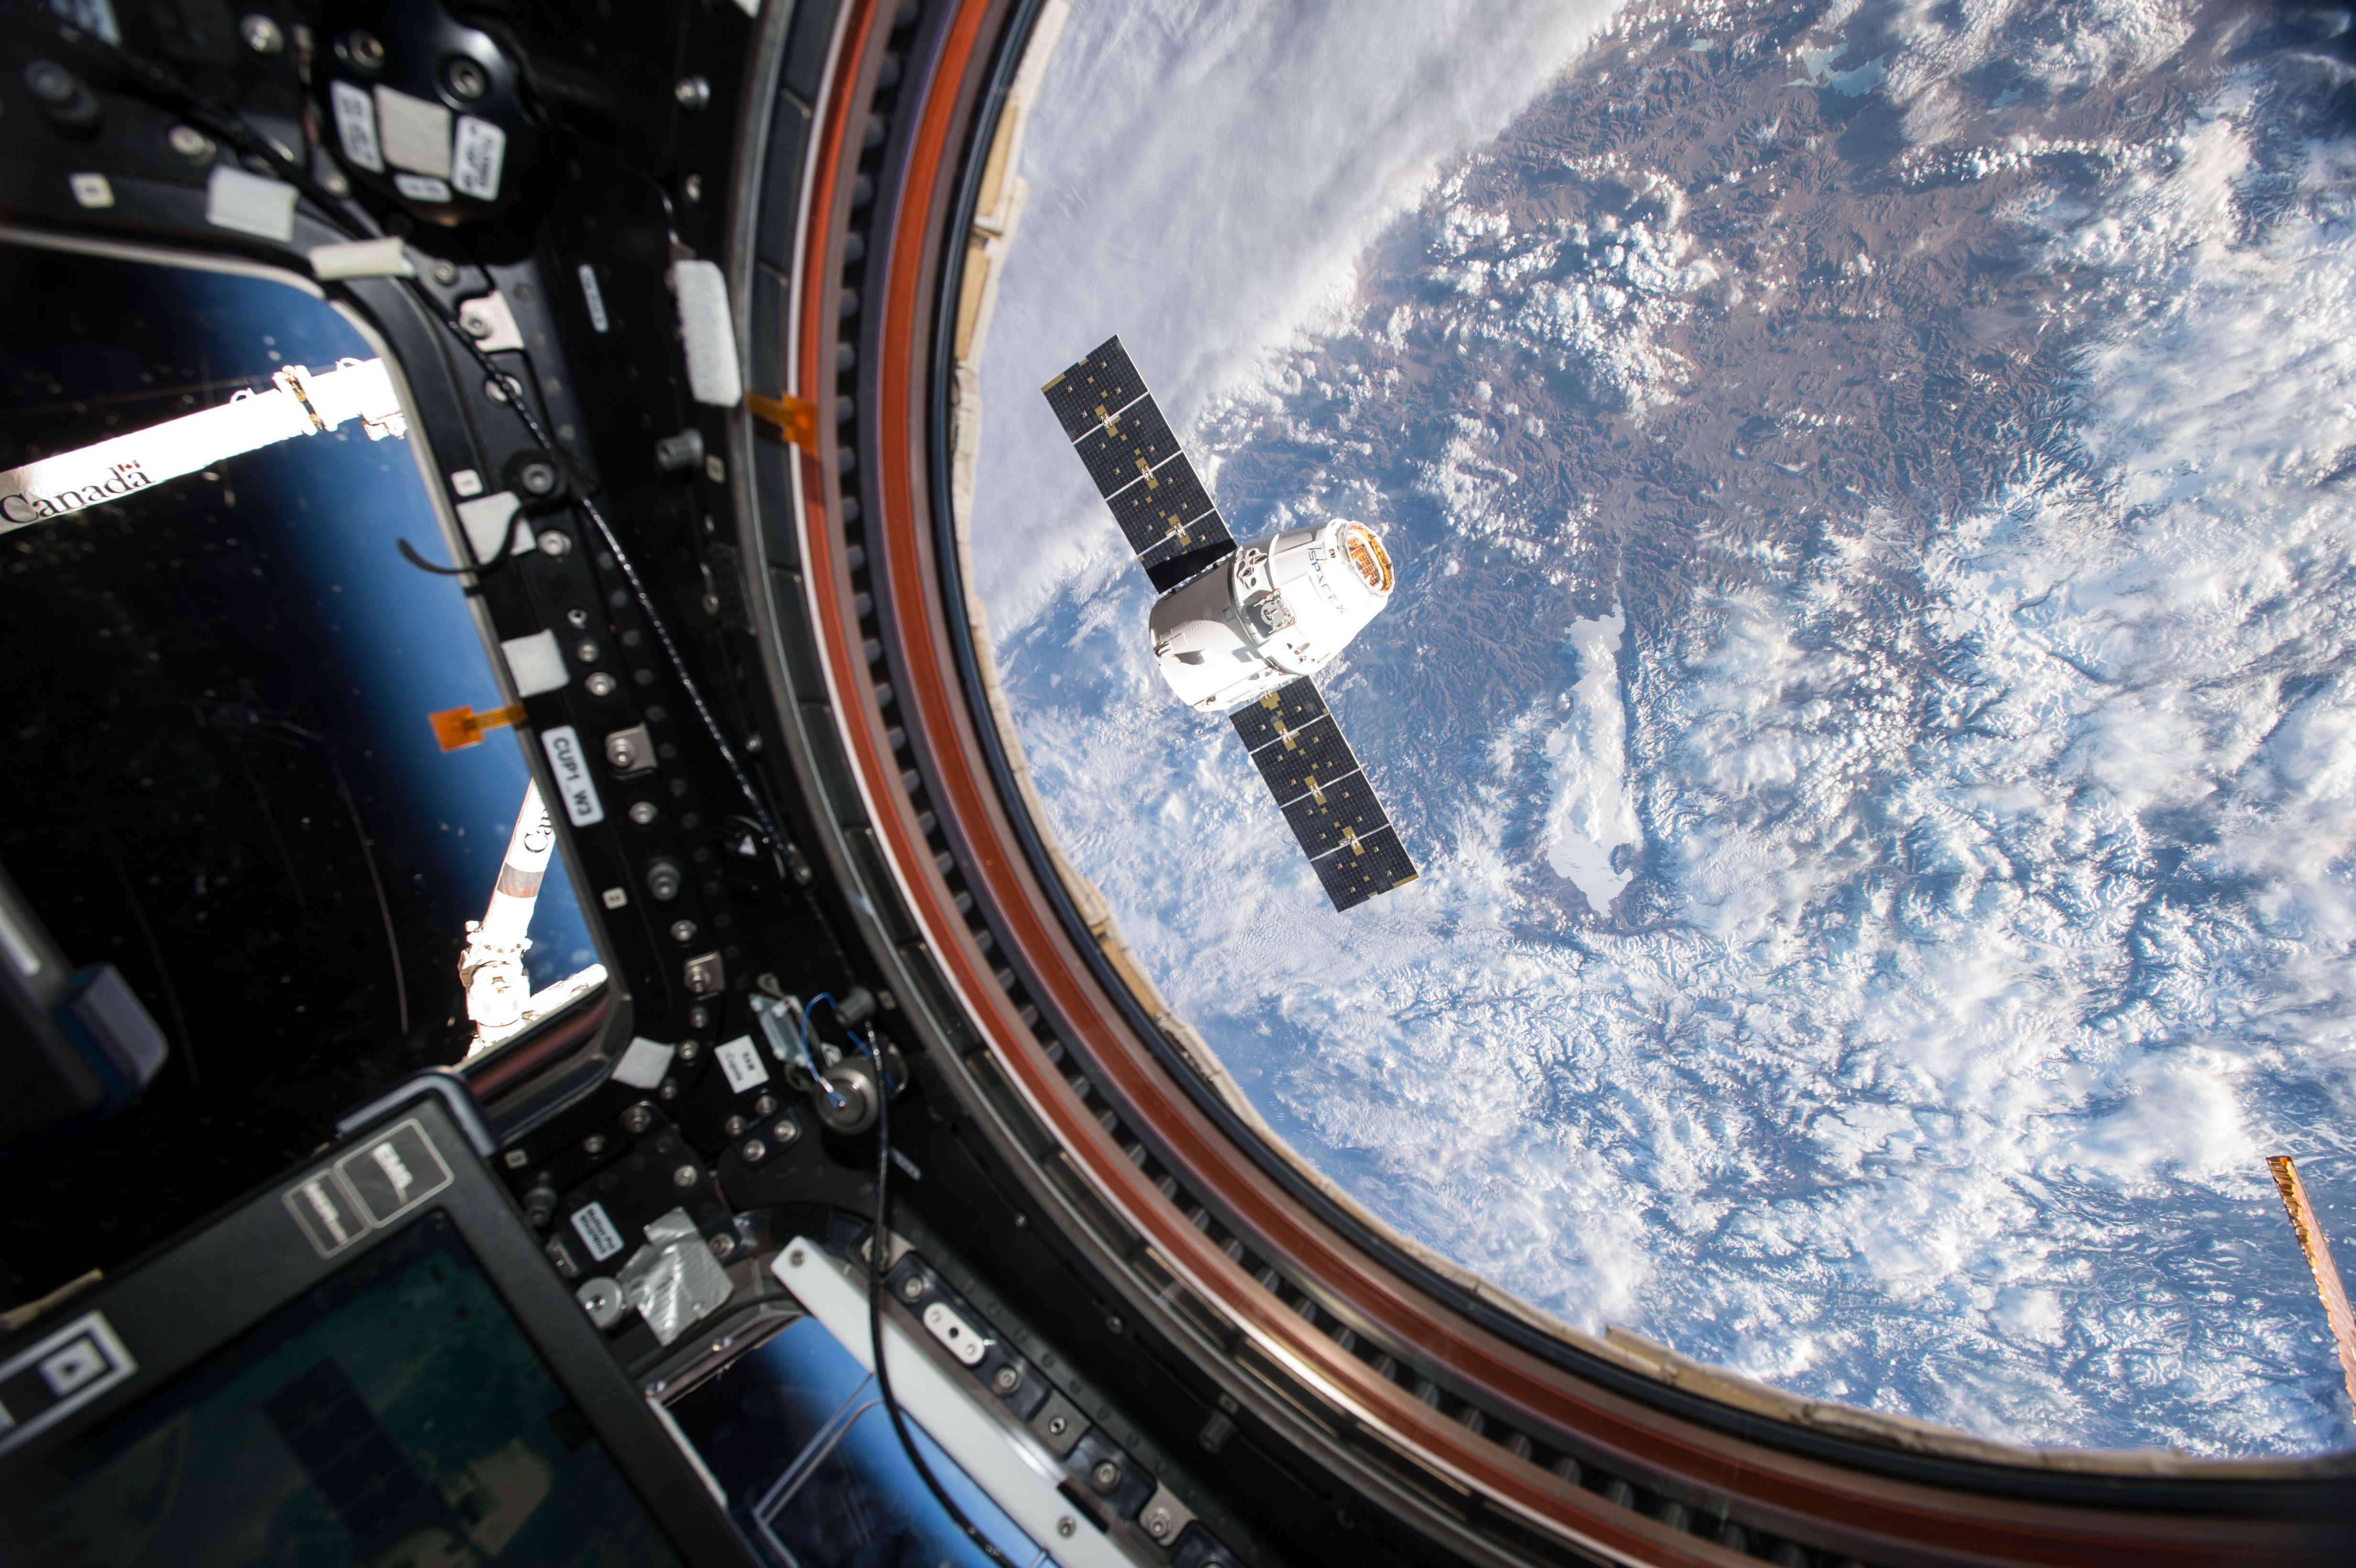 us nasa space station - photo #3